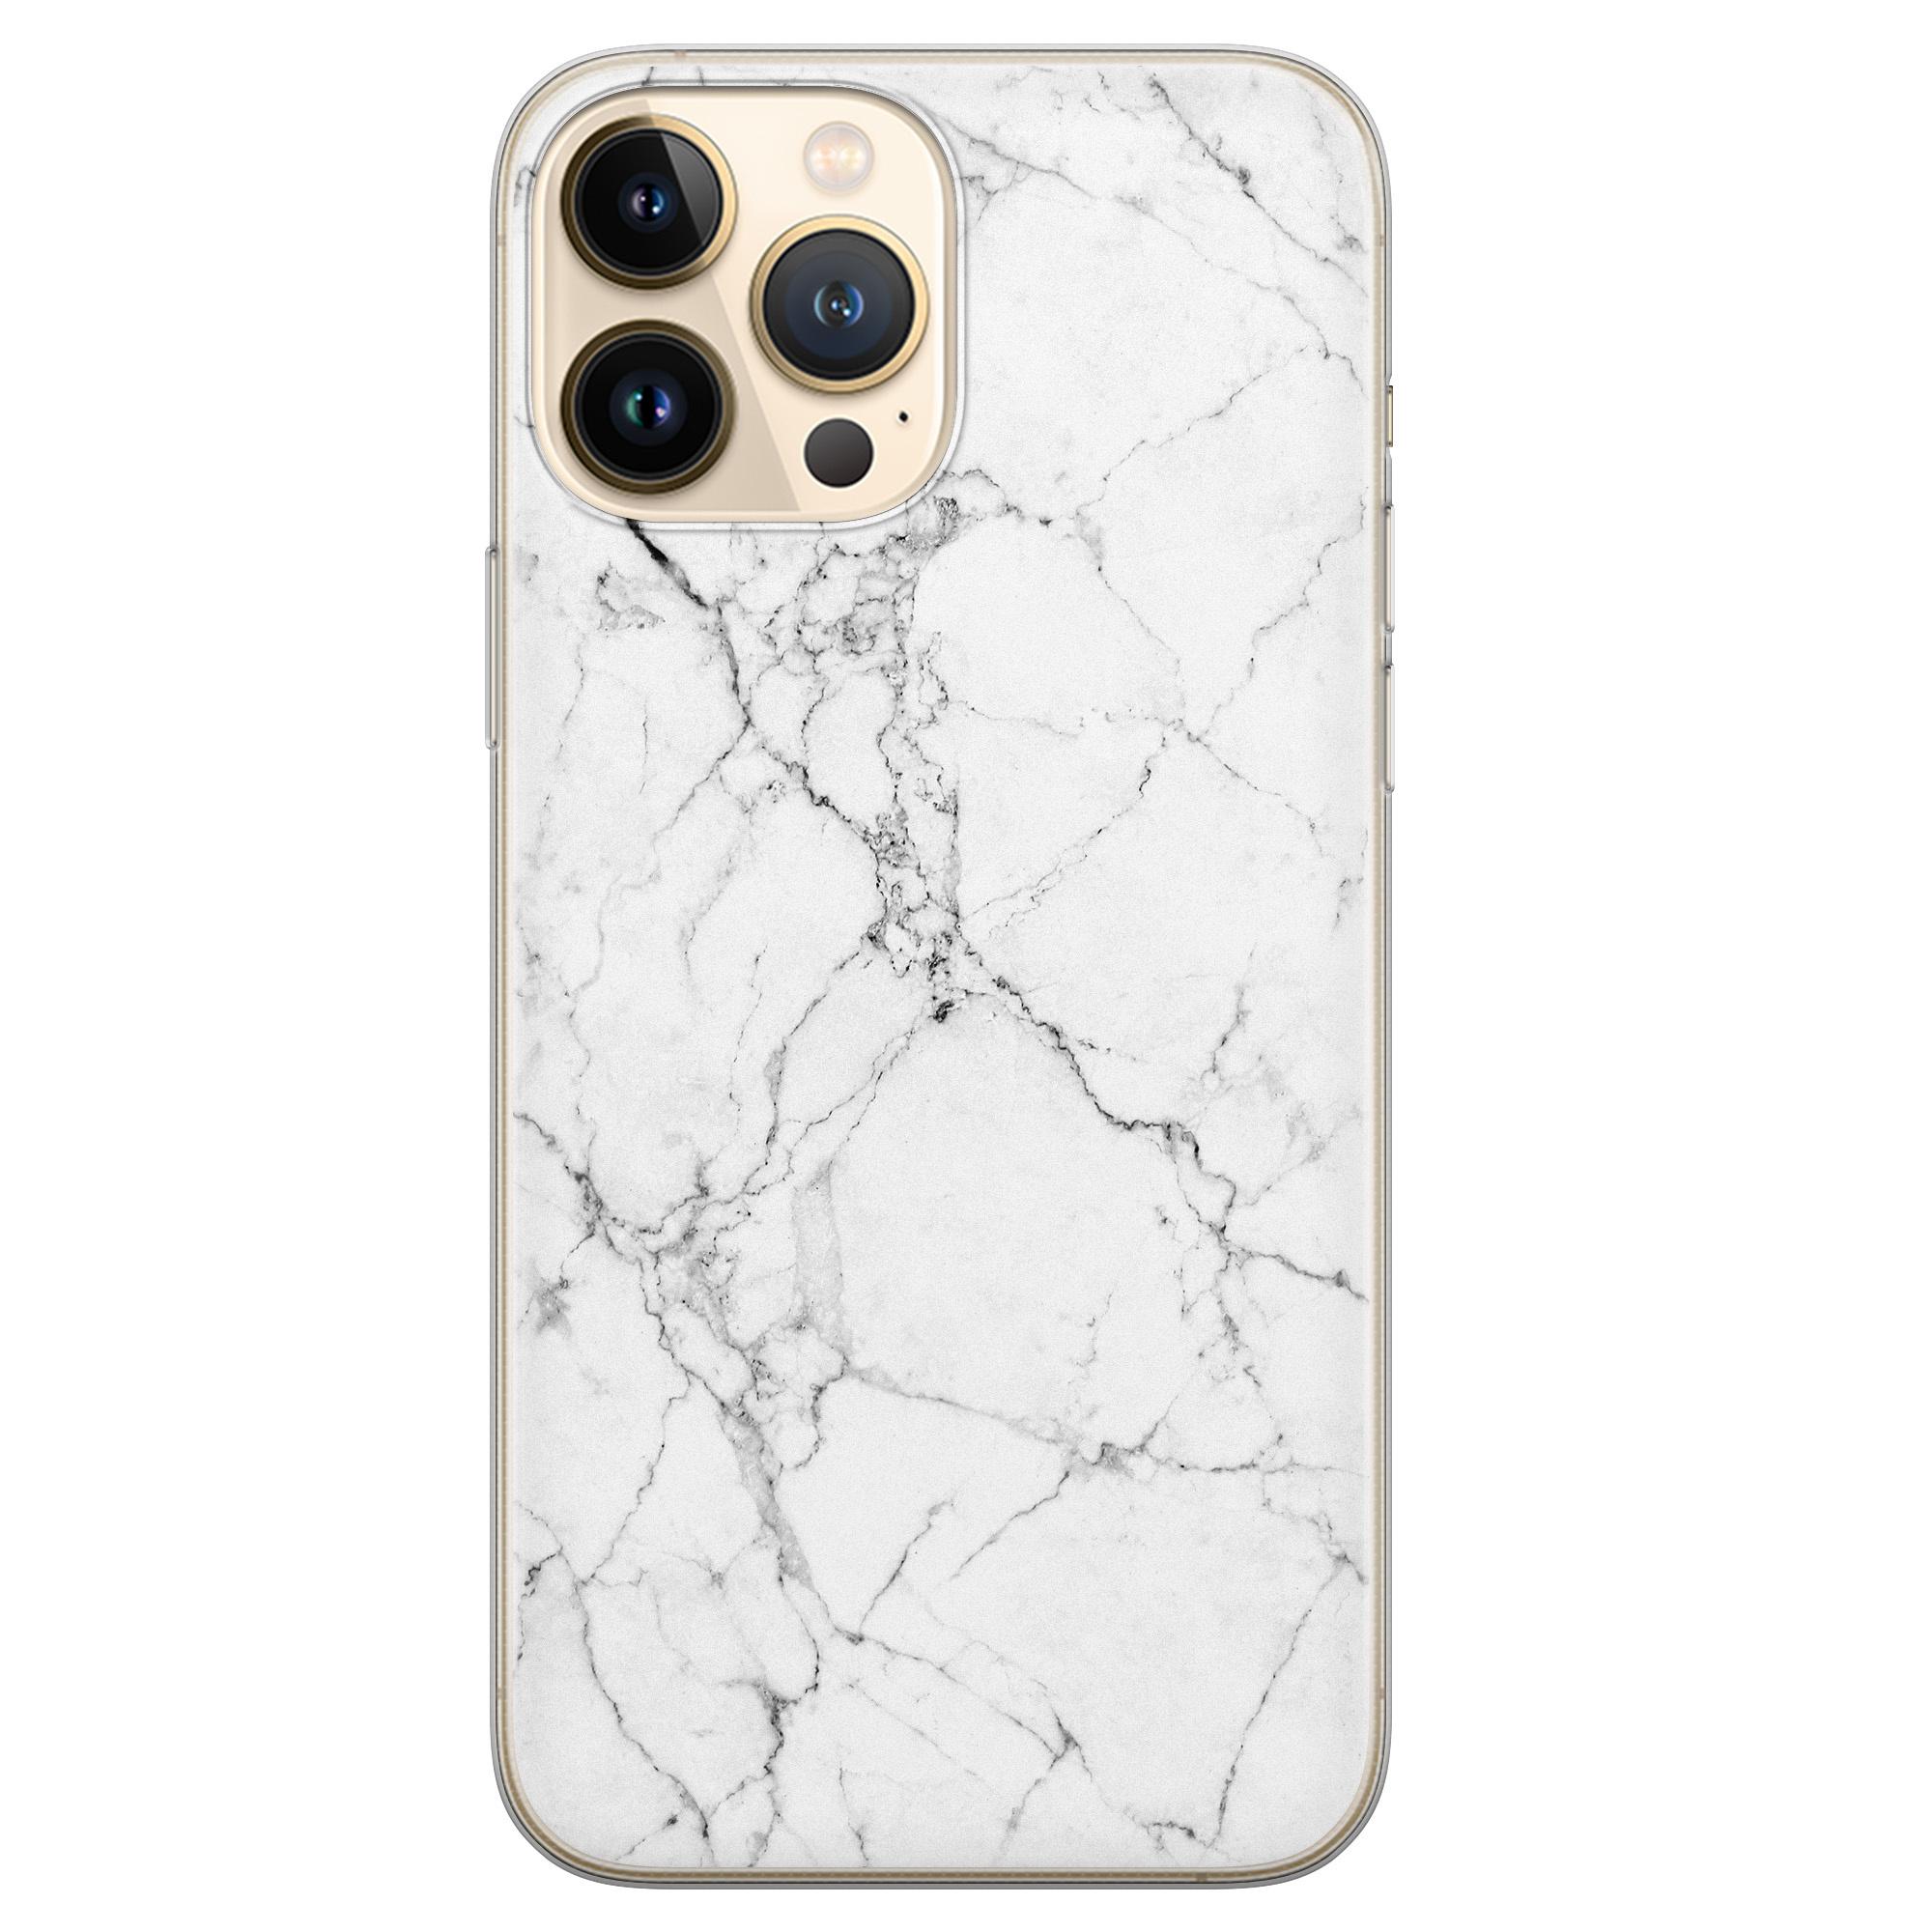 Leuke Telefoonhoesjes iPhone 13 Pro Max siliconen hoesje - Marmer grijs